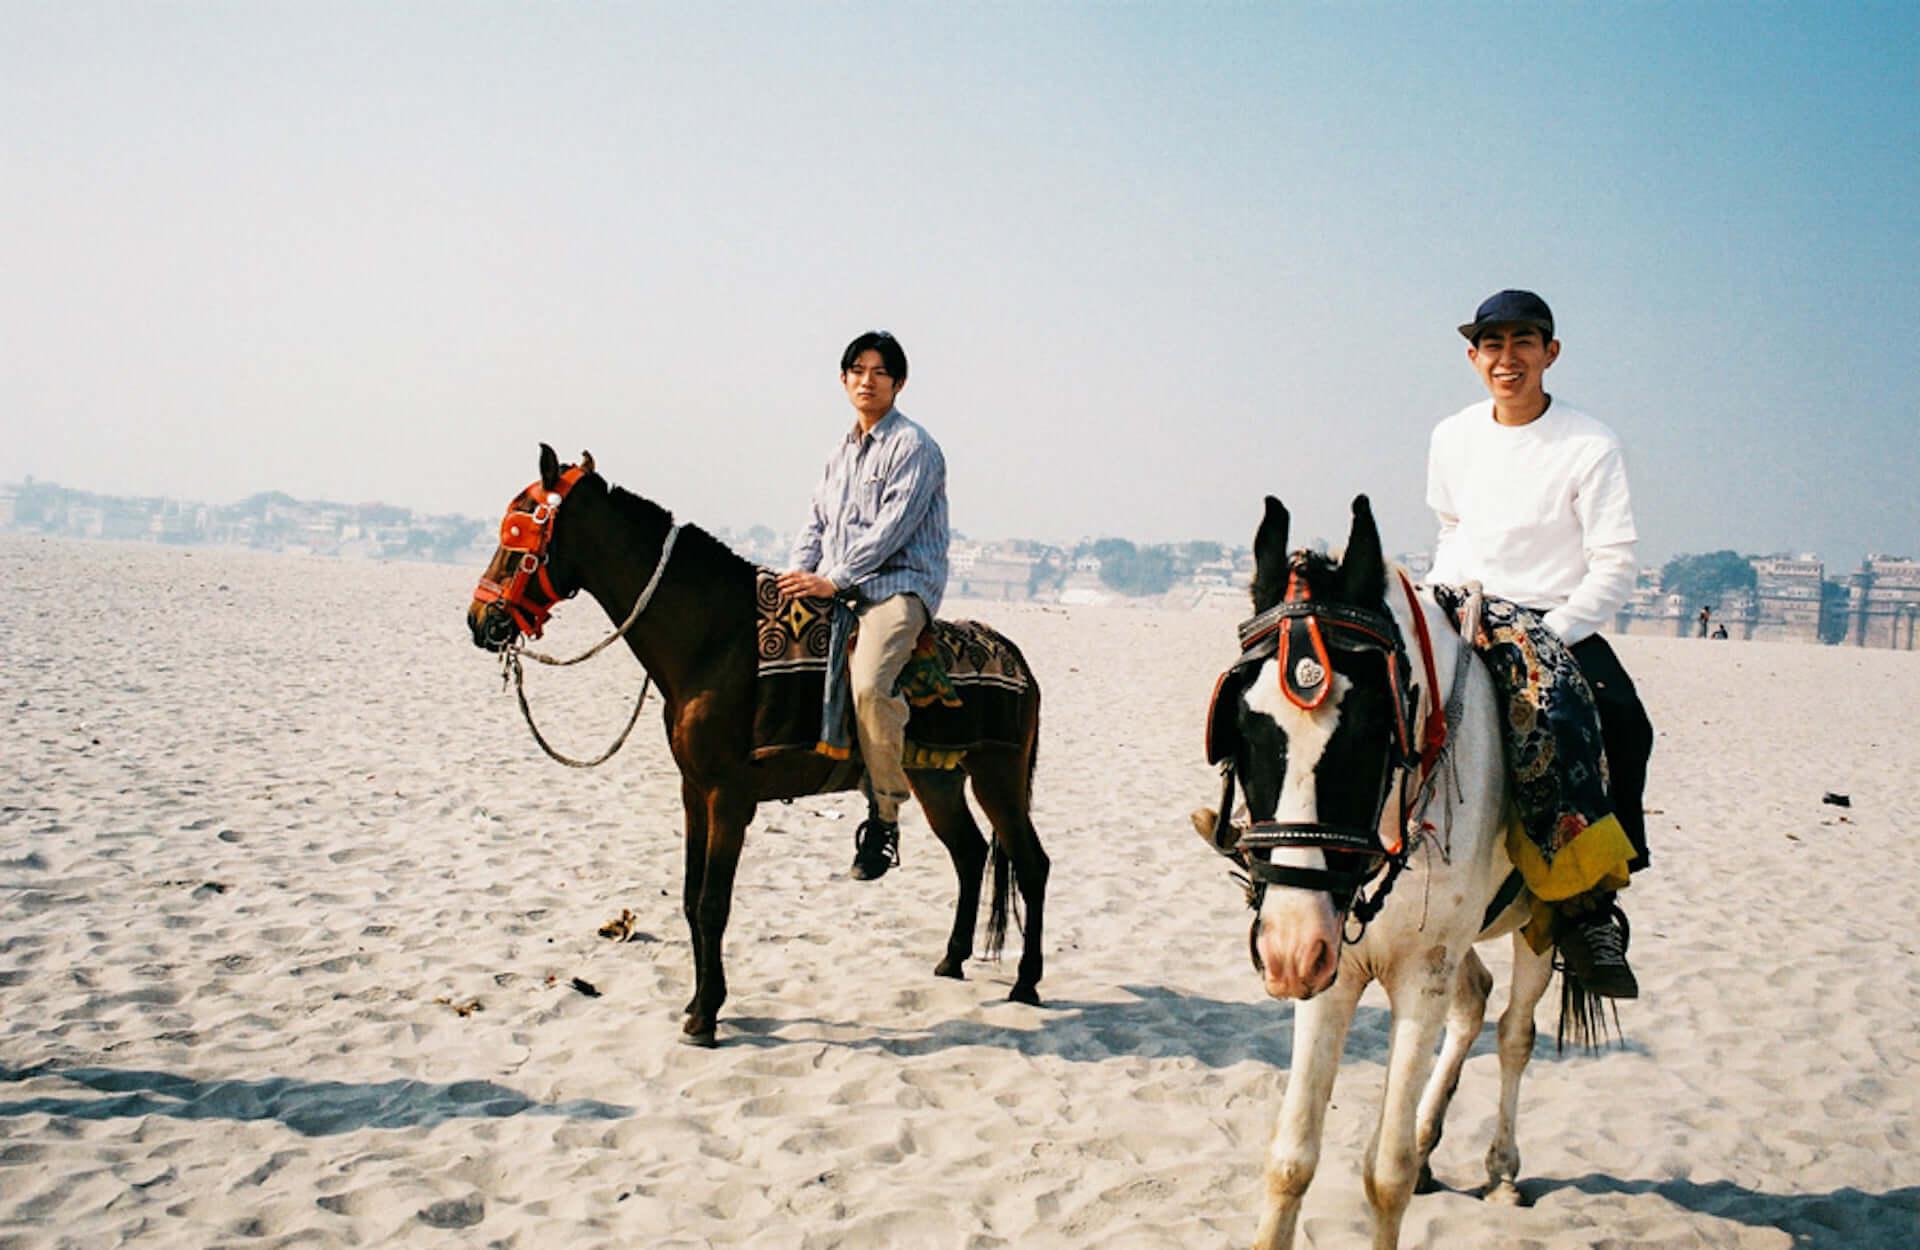 Gateballers ×写真家・相澤有紀、インド旅をまとめたドキュメンタリーブック創刊|Campfireでのプロジェクトがスタート art190723_gateballers_main-1920x1250